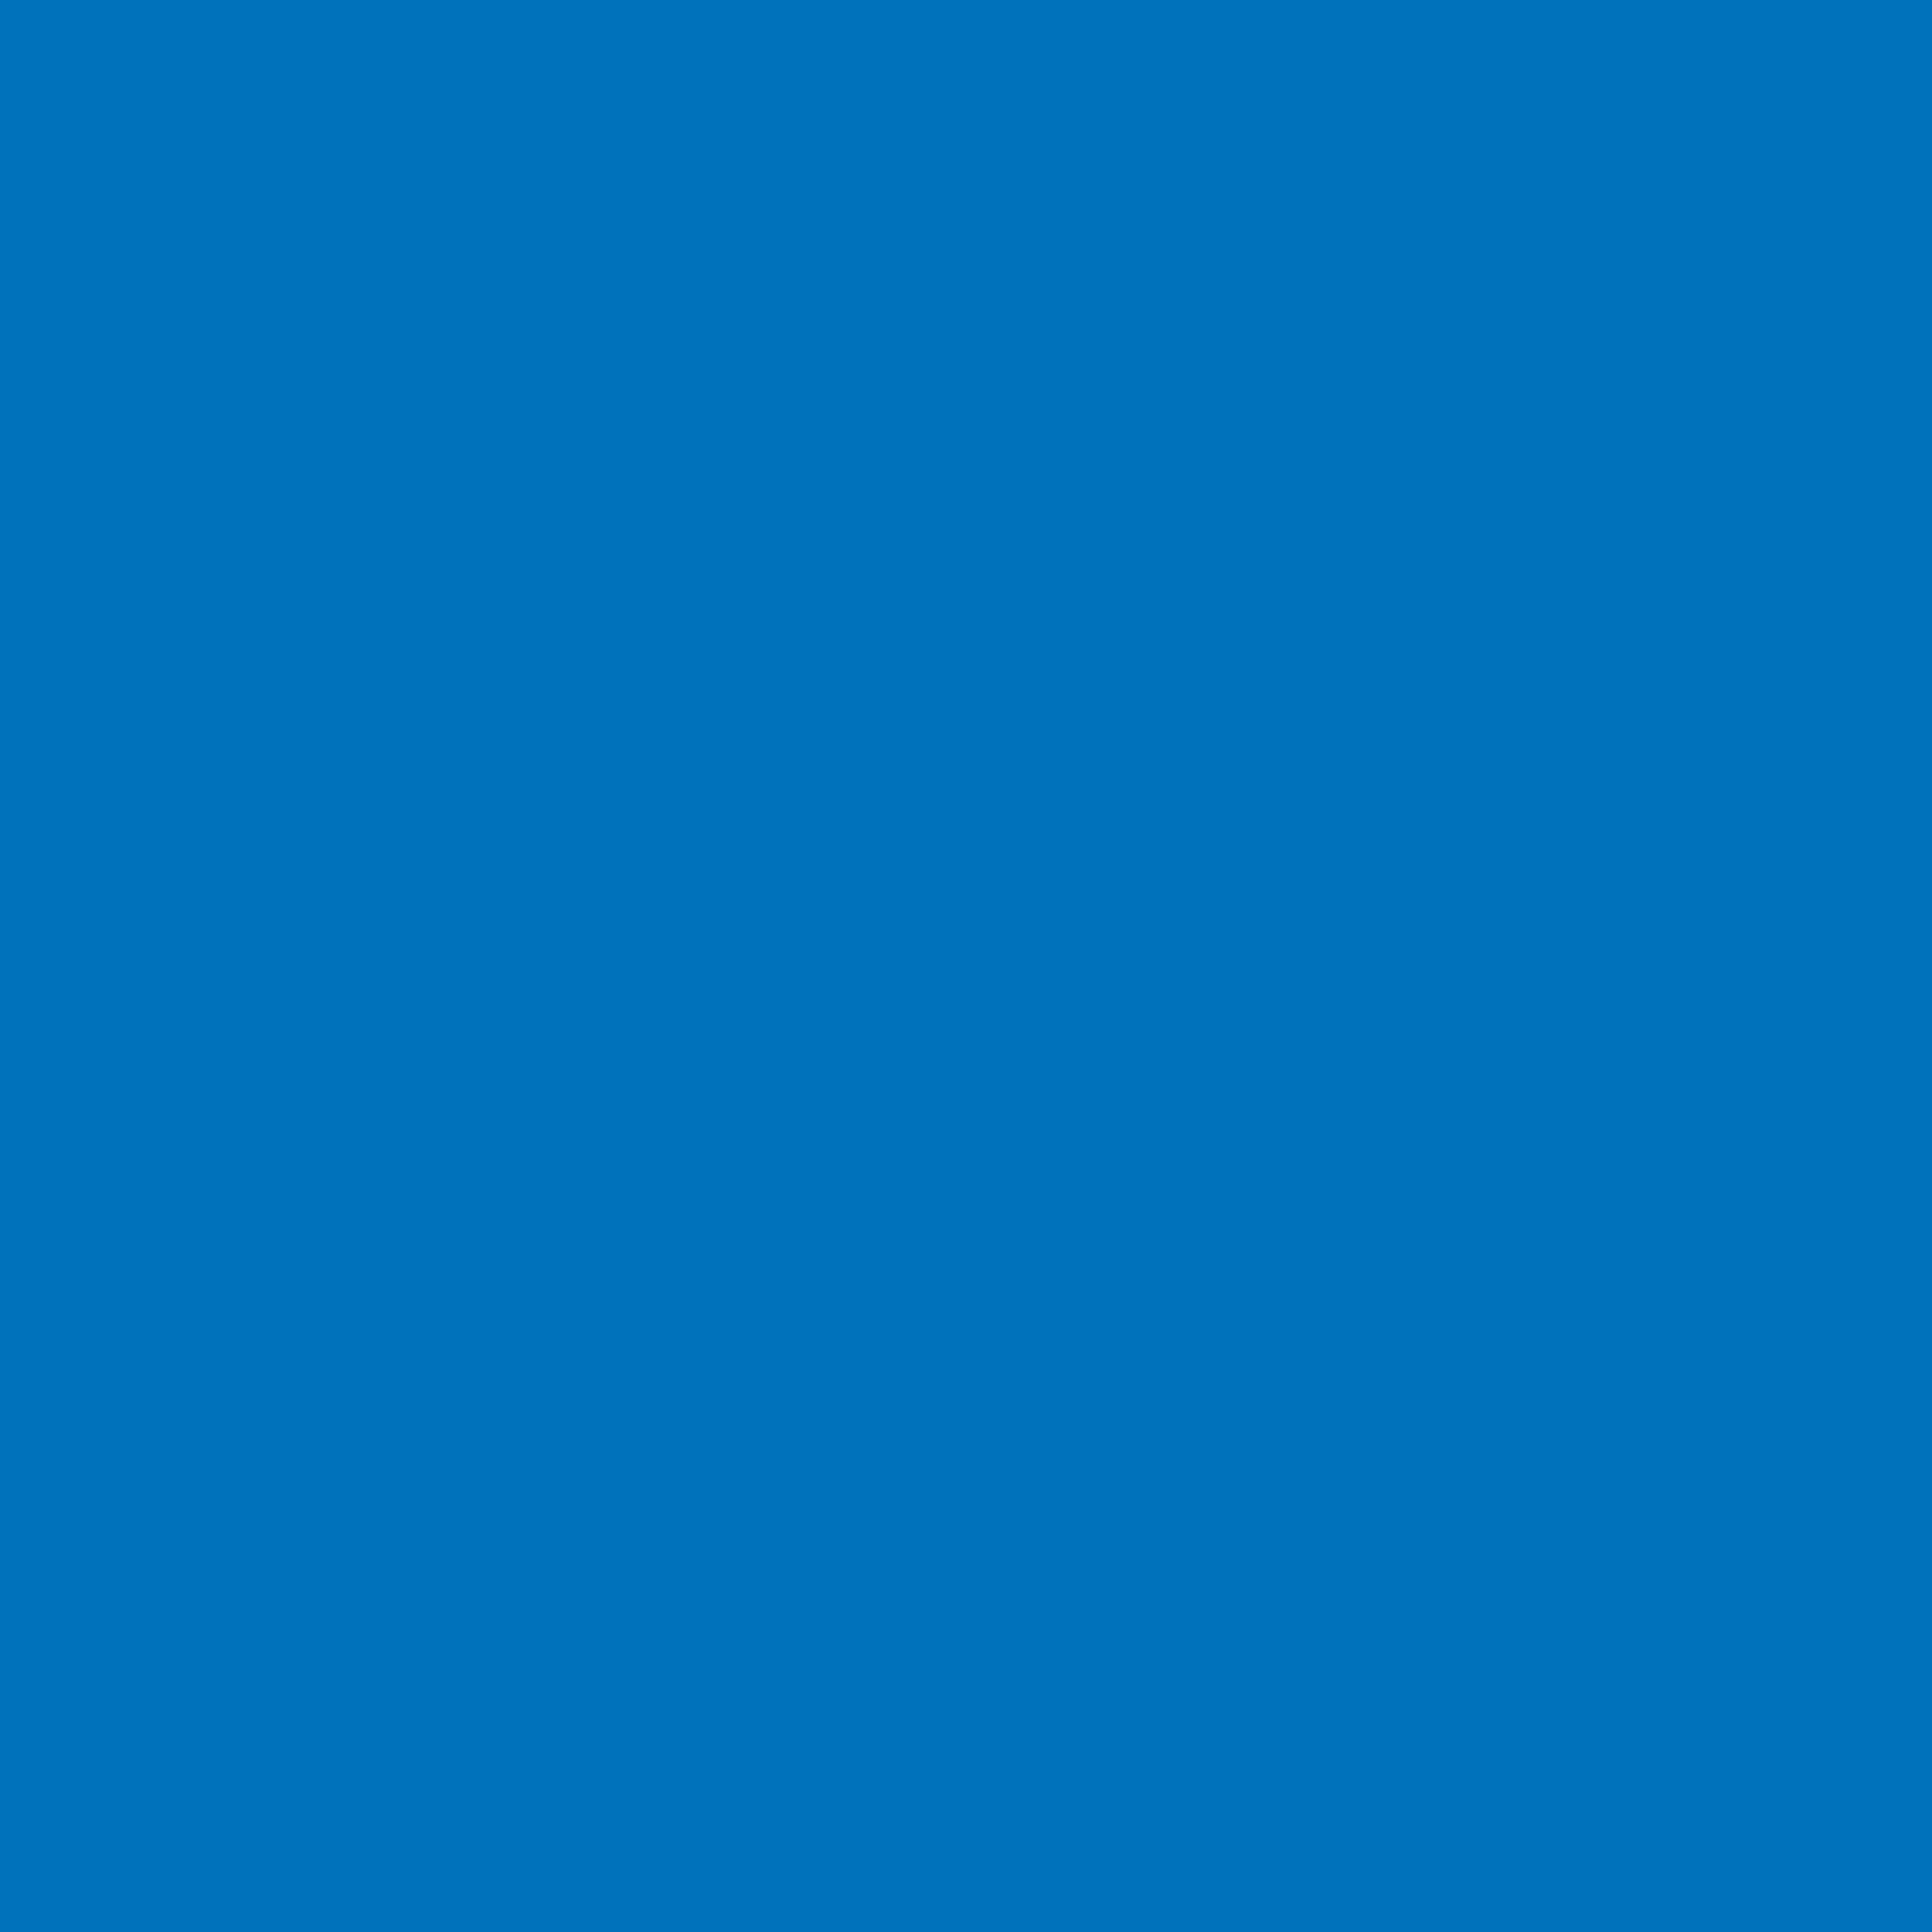 Pentel Refill Lead Blue (0.5mm) Medium 12 Pcs/Tube, 12 Tubes of Lead (PPB-5) by Pentel (Image #2)